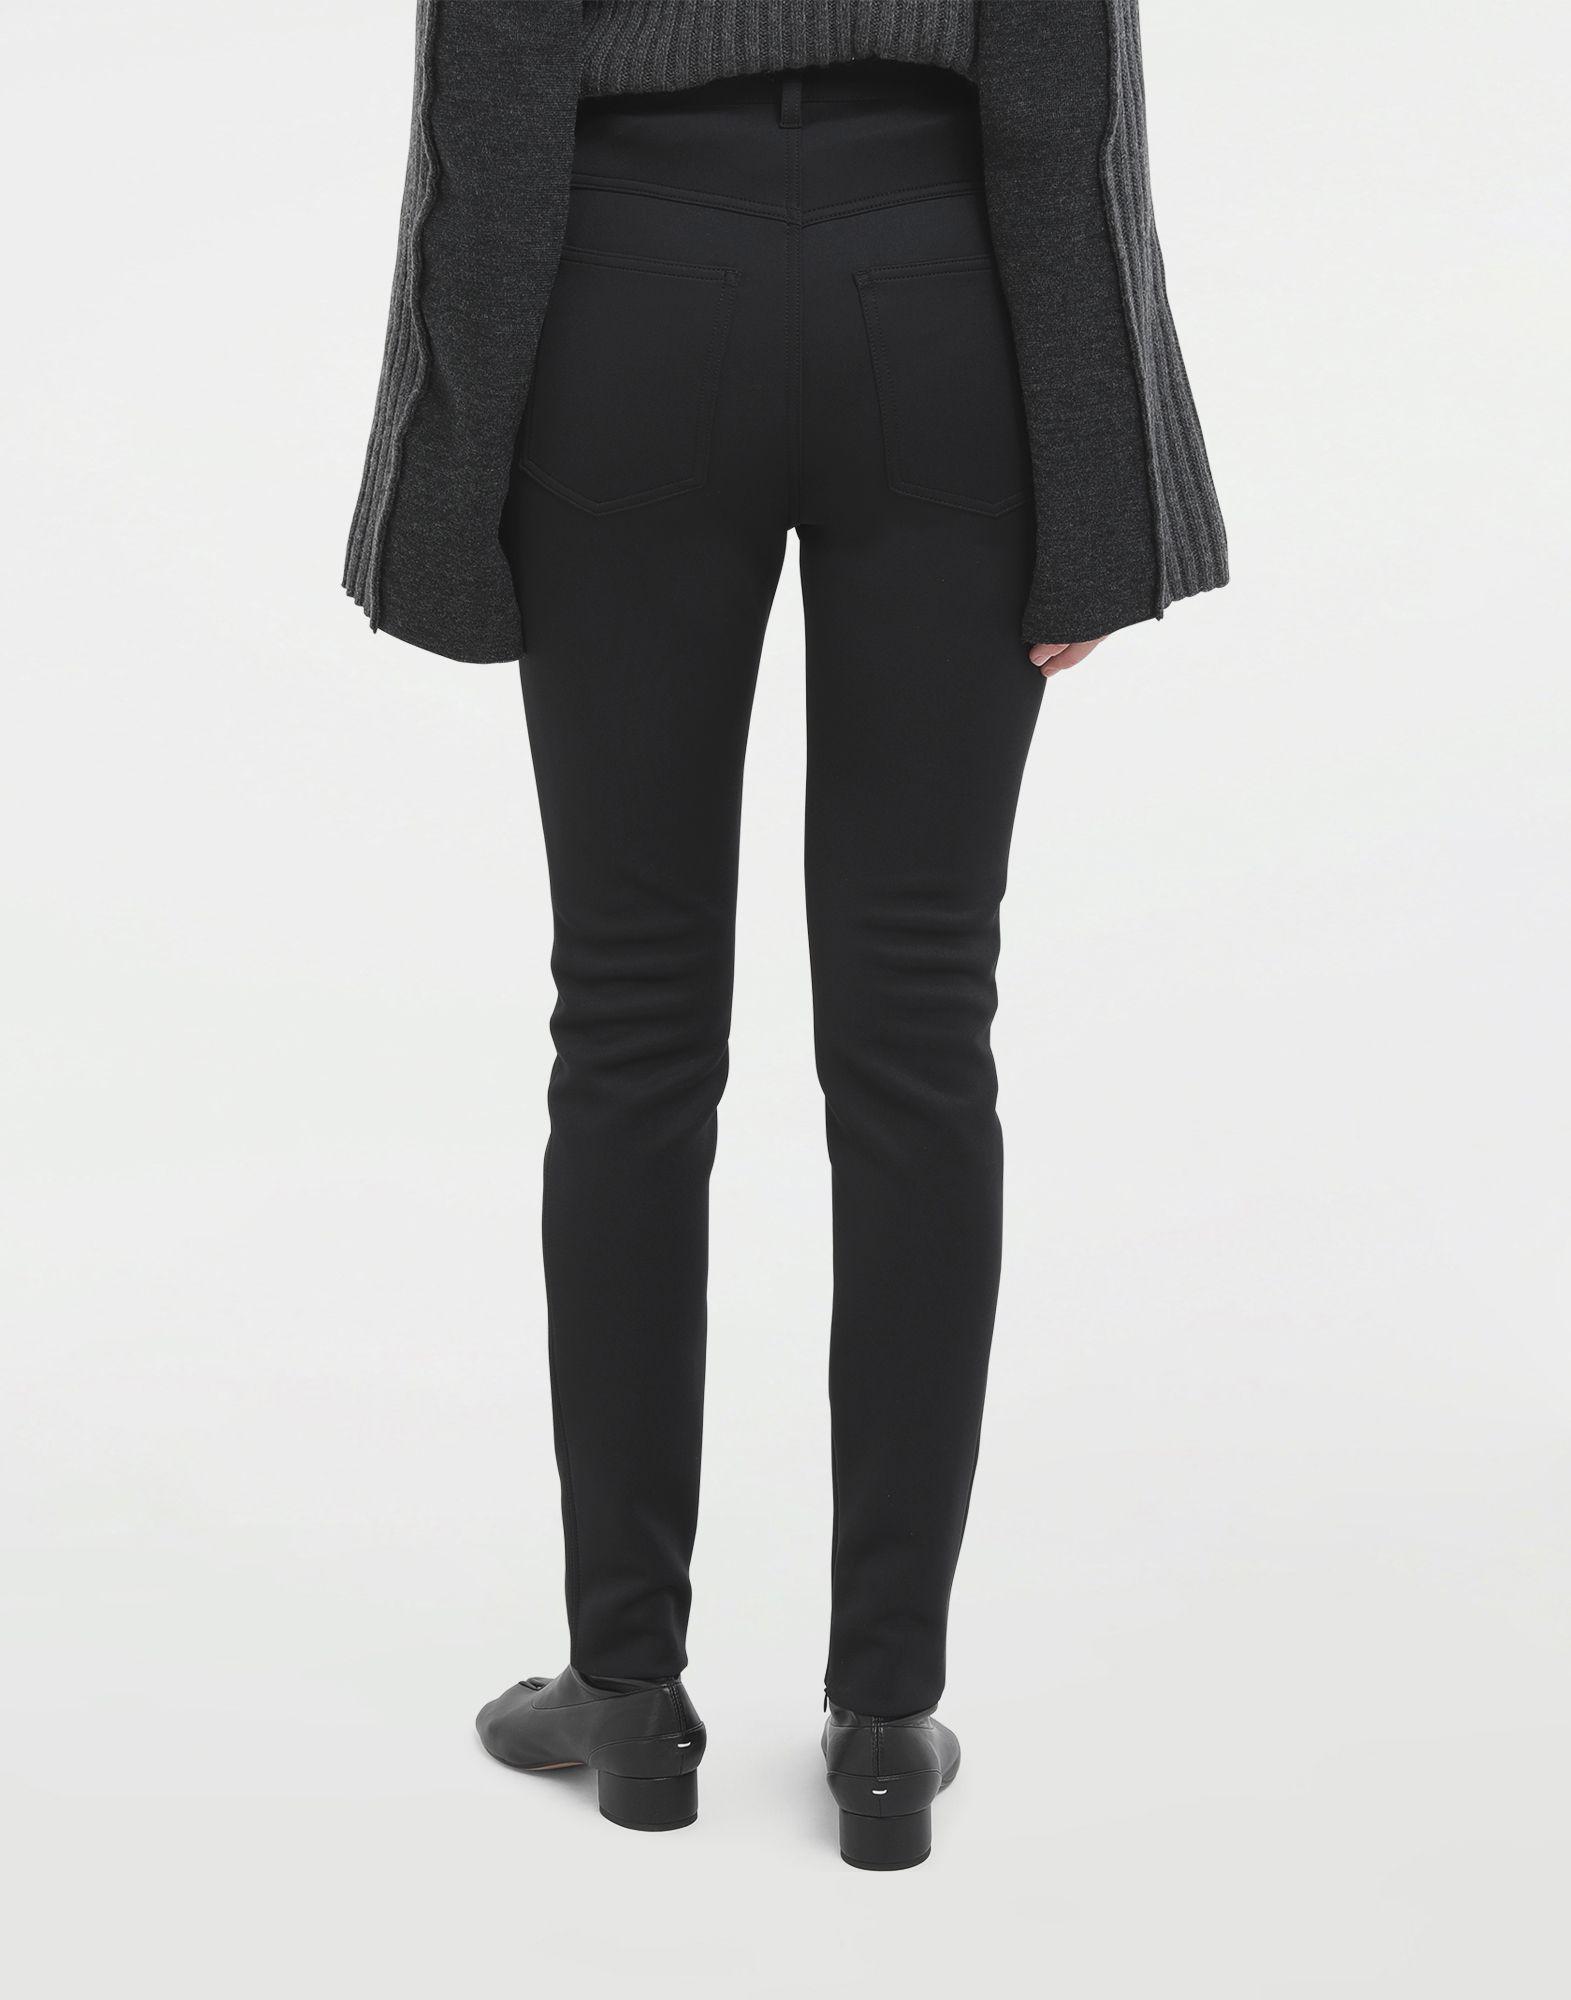 MAISON MARGIELA Skinny neoprene pants Casual pants Woman d